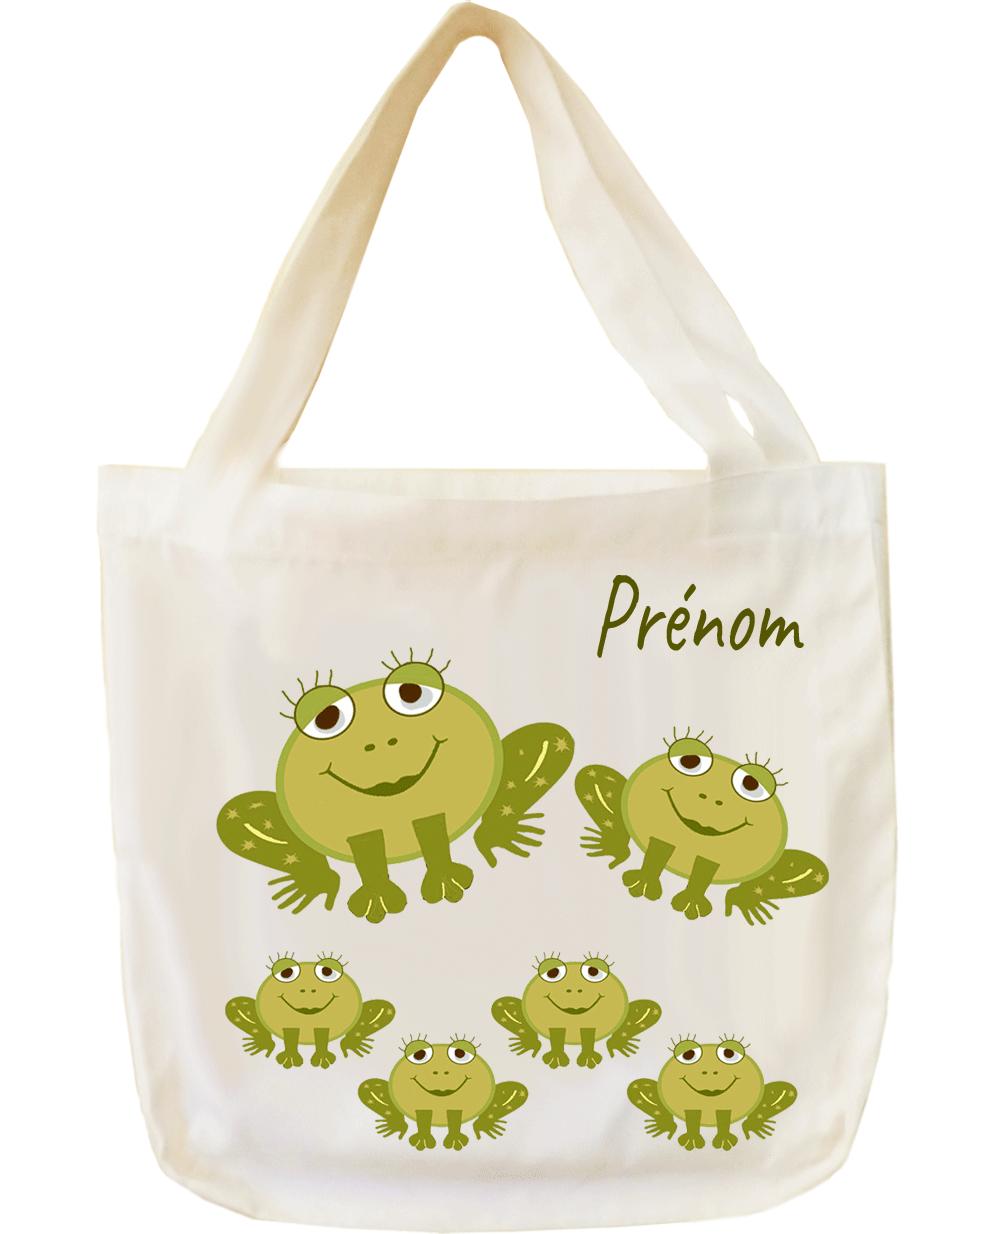 tote-bag;sac;cabas;texti;cadeaux;personnalisable;personnalisation;personnalise;prenom;animal;grenouille